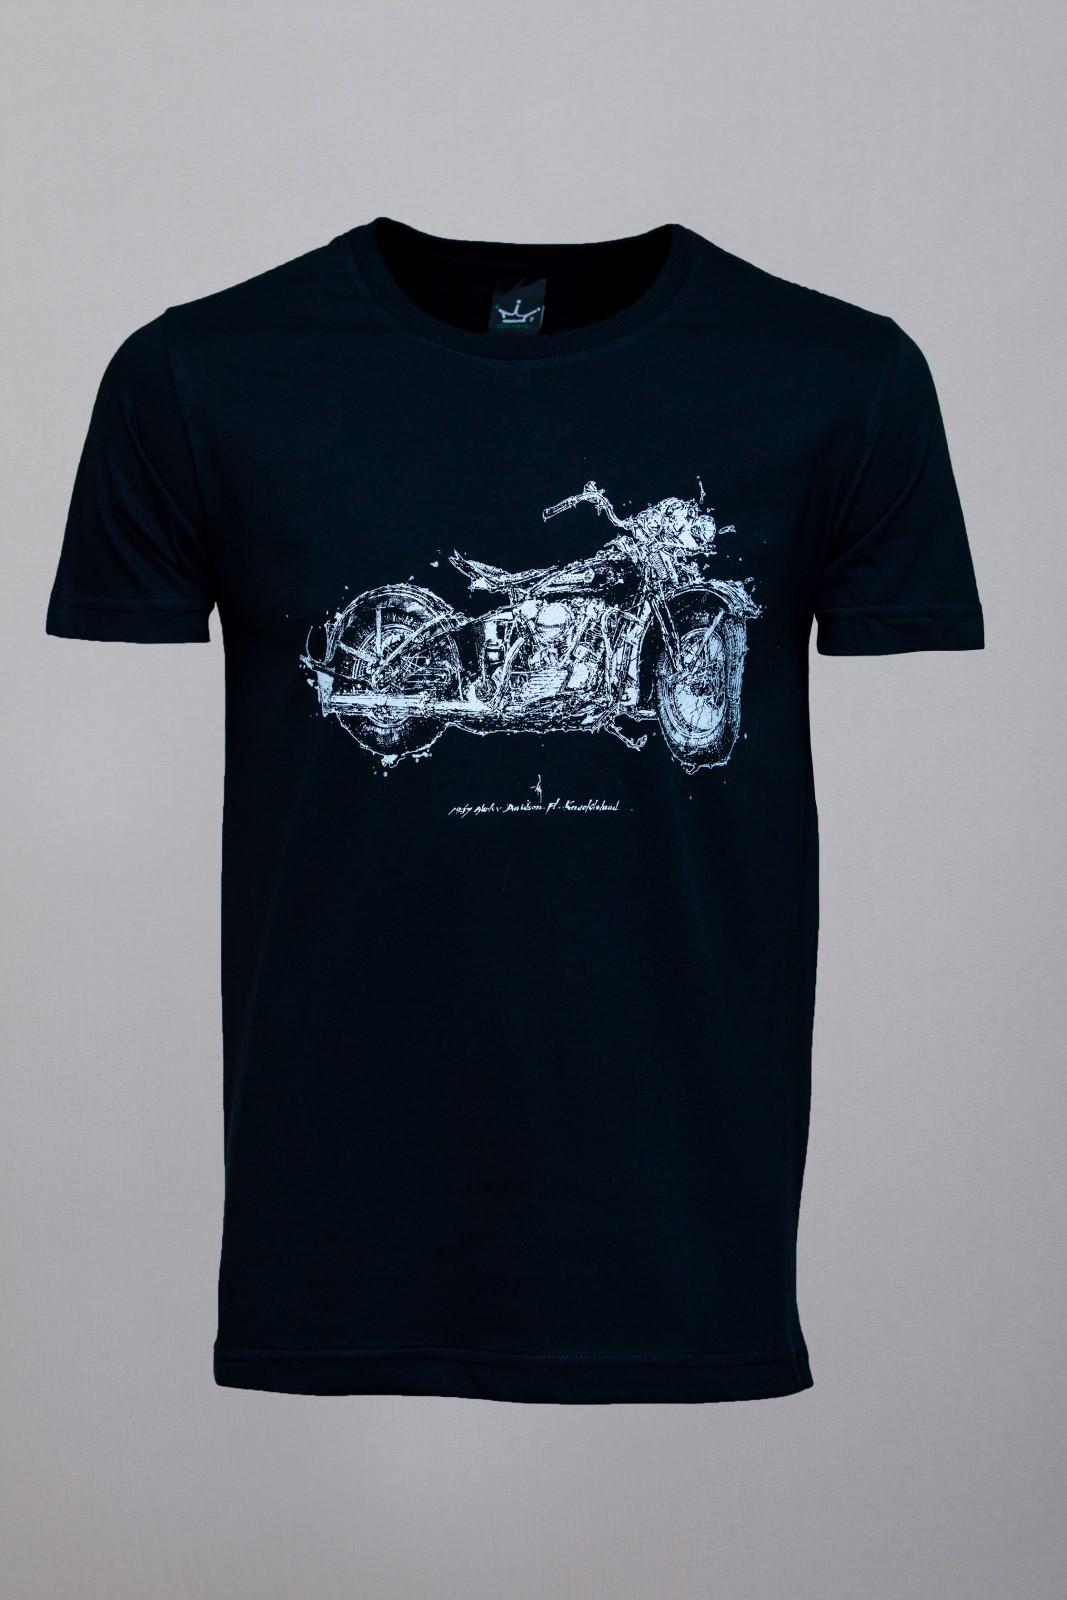 Camiseta CoolWave Motorcycle Soul Preta